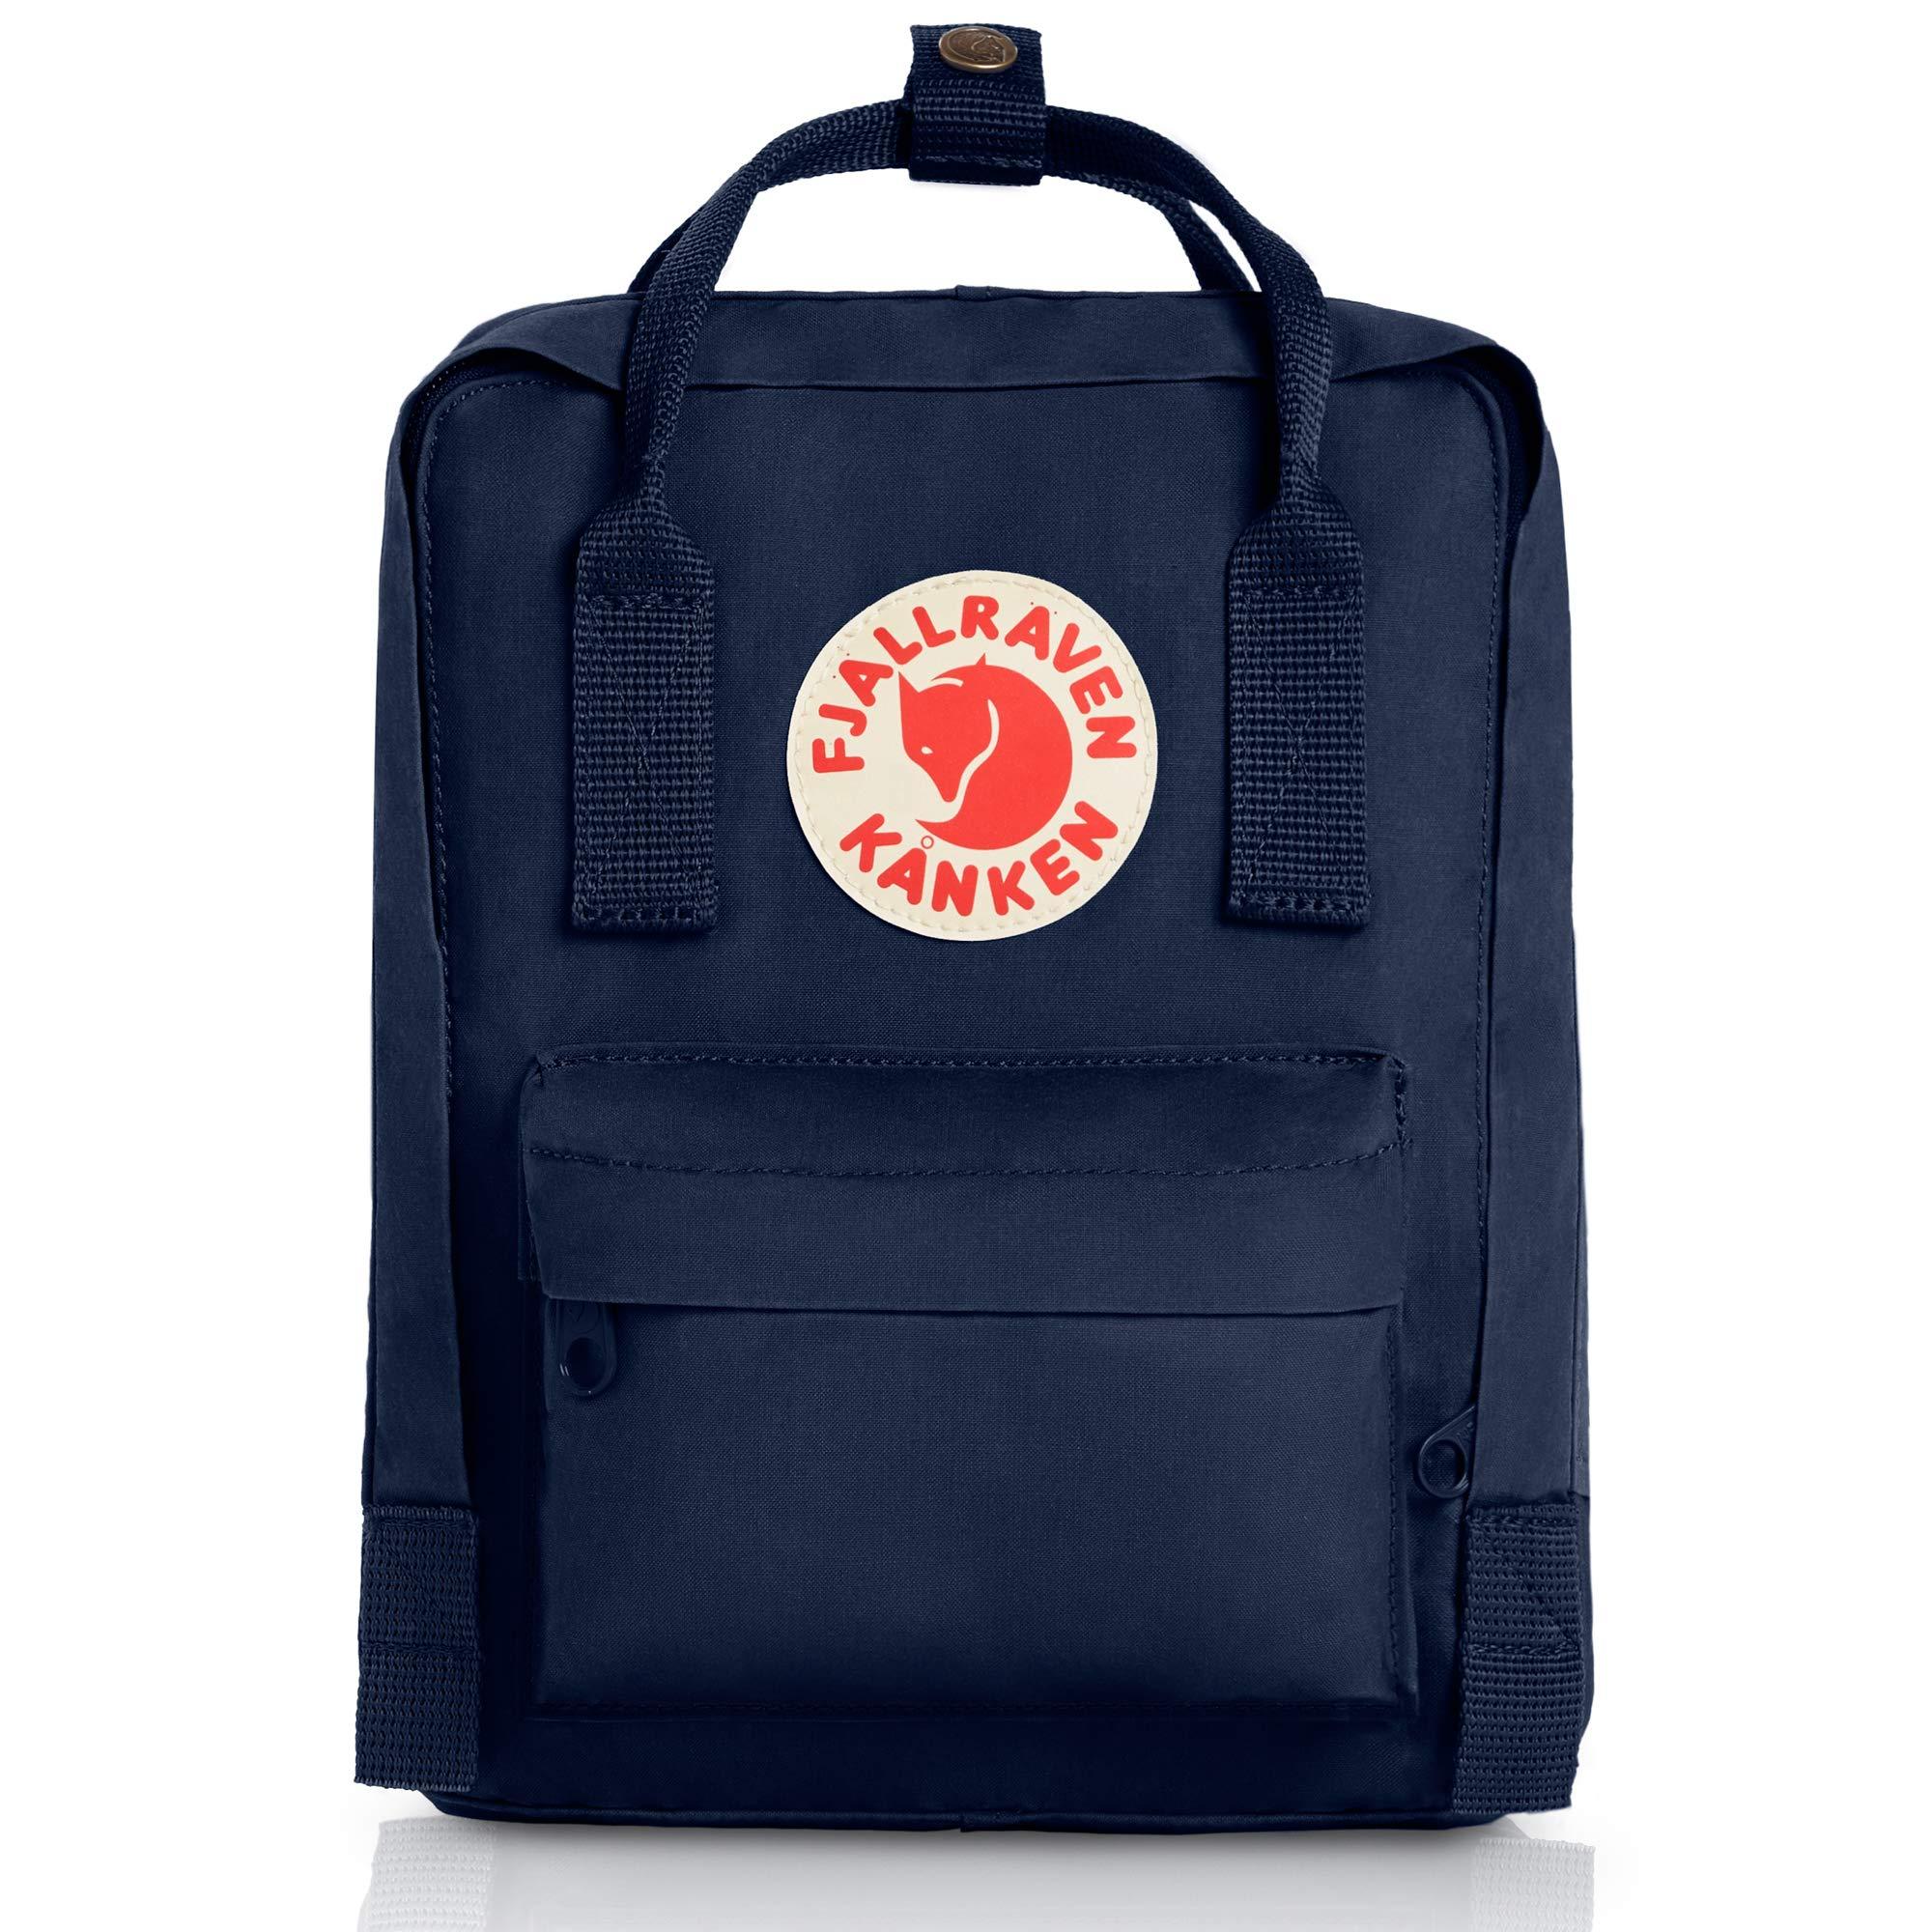 Fjallraven - Kanken Mini Classic Backpack for Everyday, Royal blue by Fjallraven